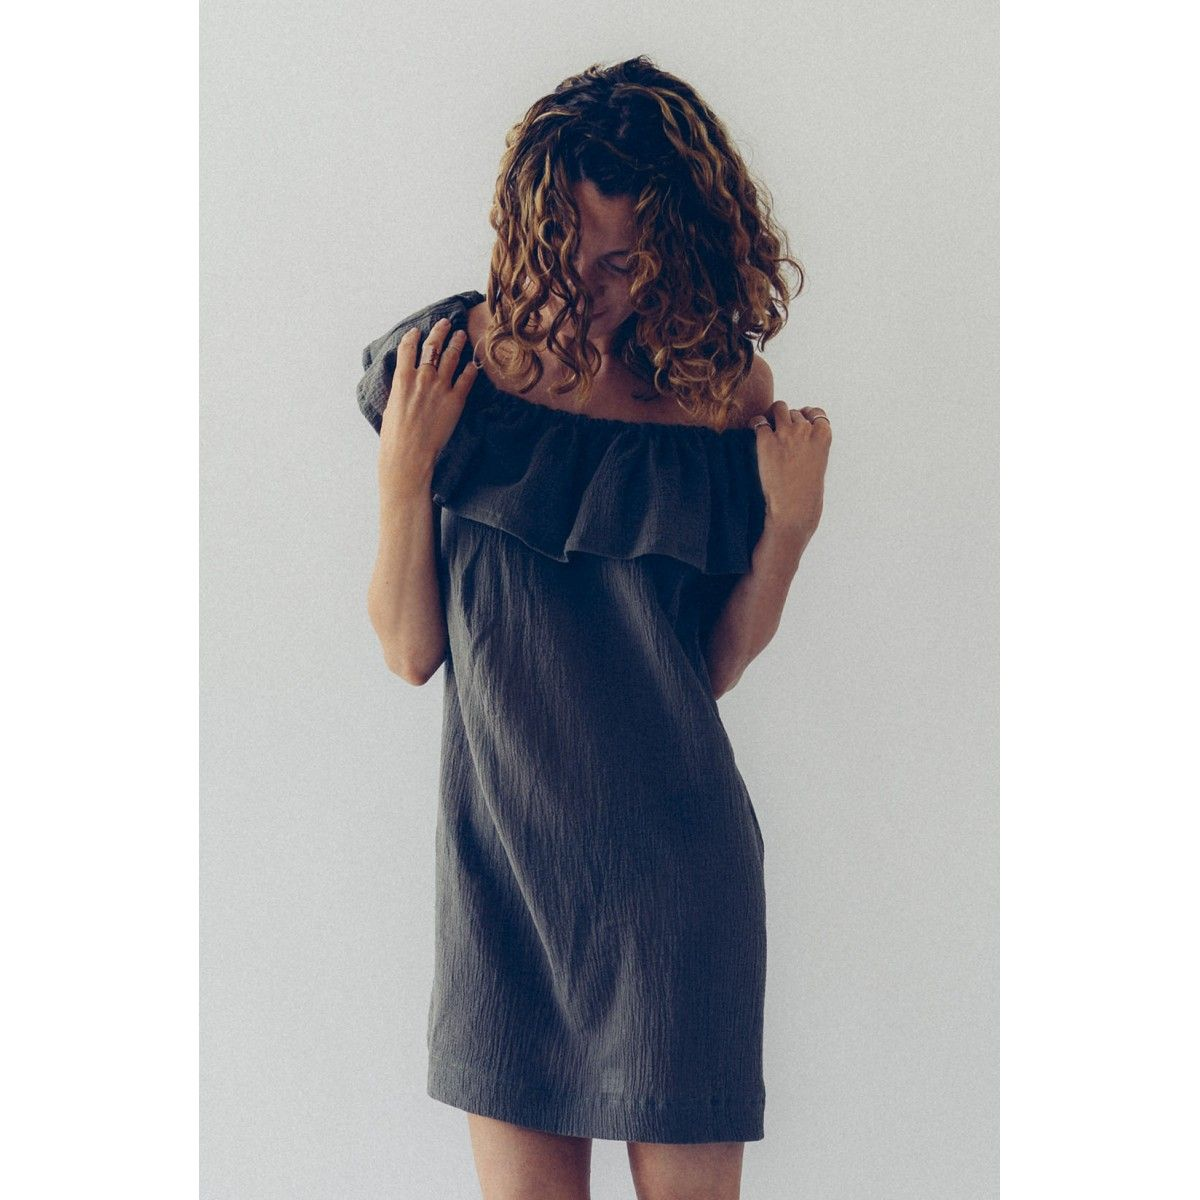 patron couture robe romantique